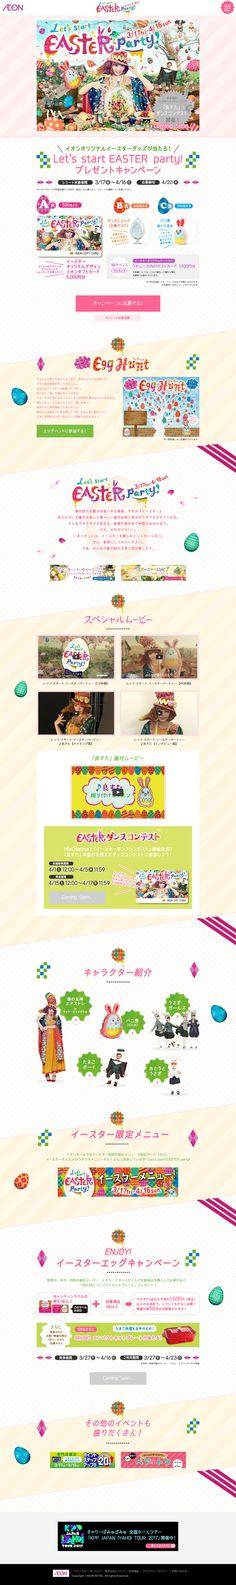 Let's start EASTER party! イオン https://www.aeon-easter.jp/index.html